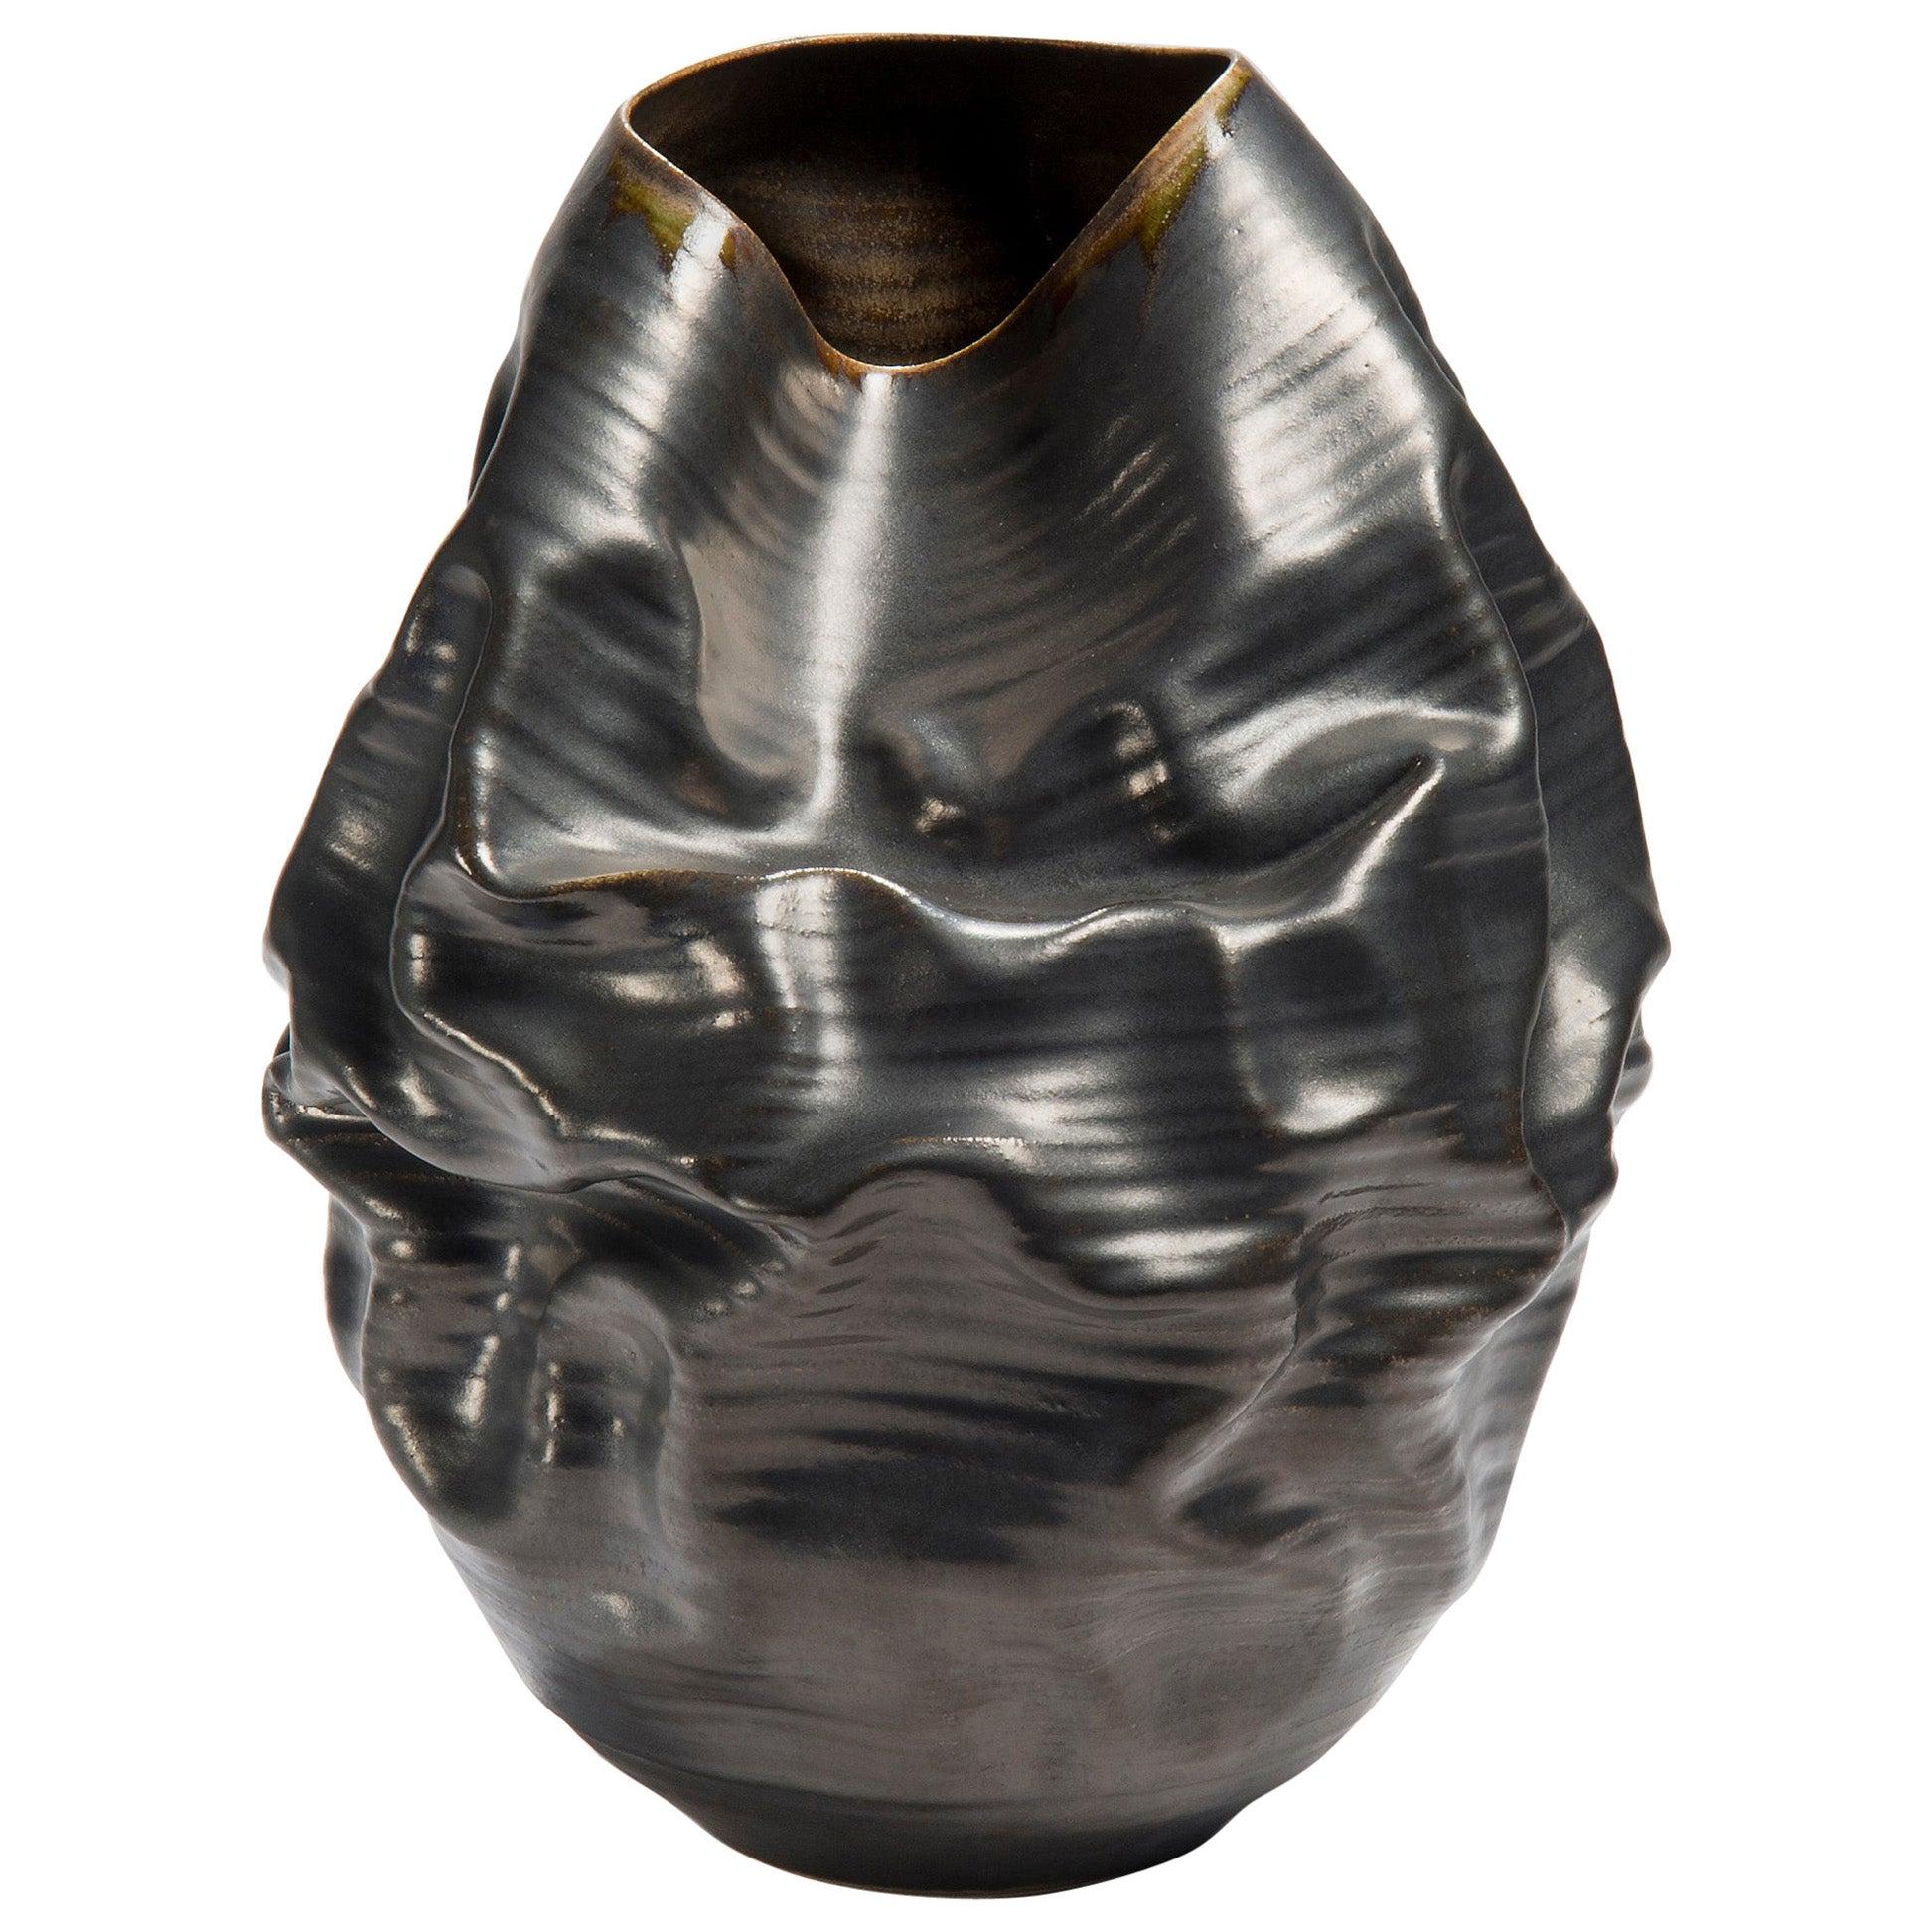 Black Metallic Dehydrated Form No 3, Ceramic Vessel by Nicholas Arroyave-Portela